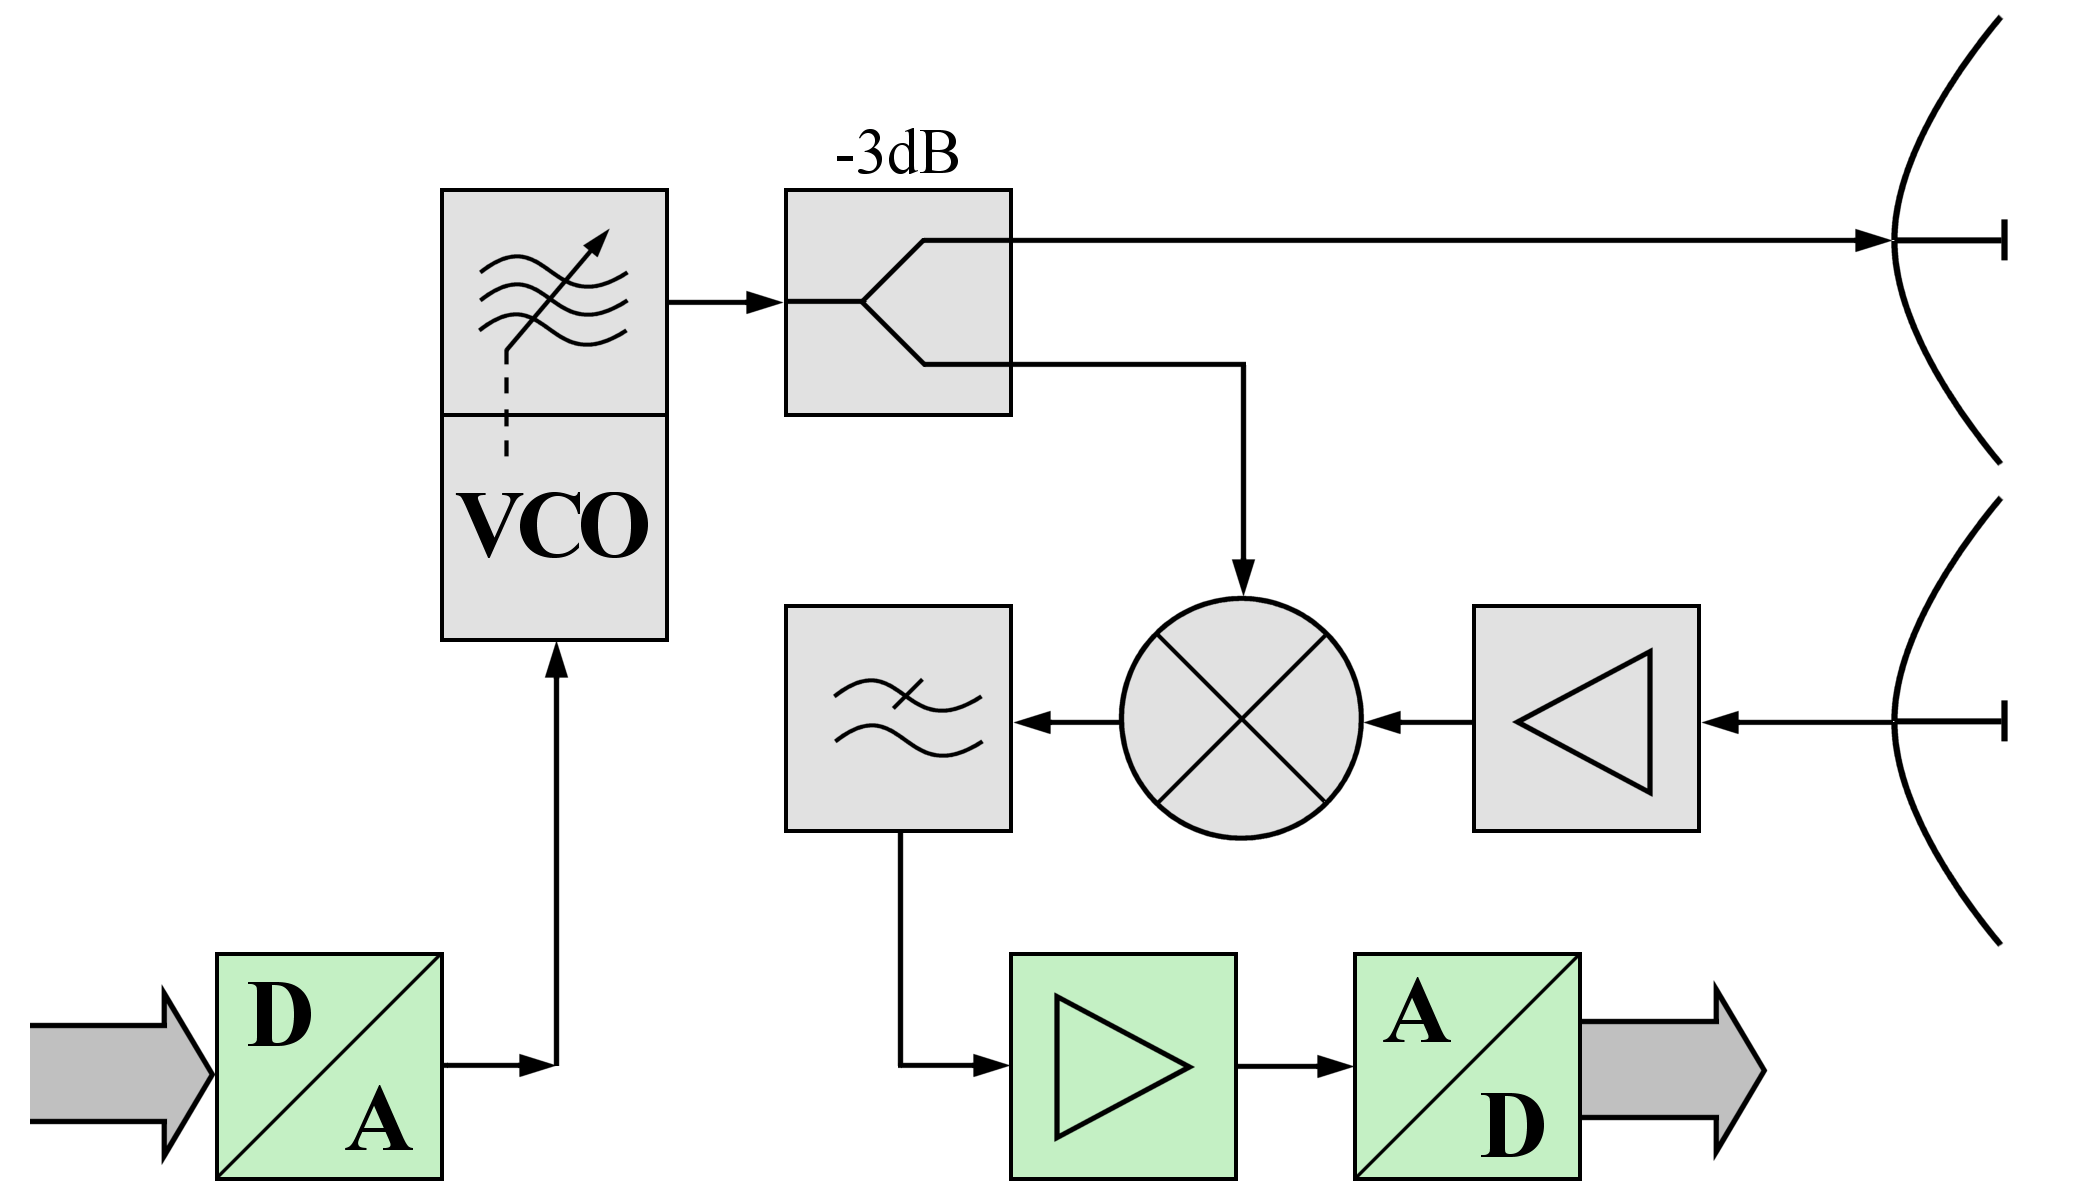 fmcw radar block diagram high resolution skeleton file bsp png wikimedia commons